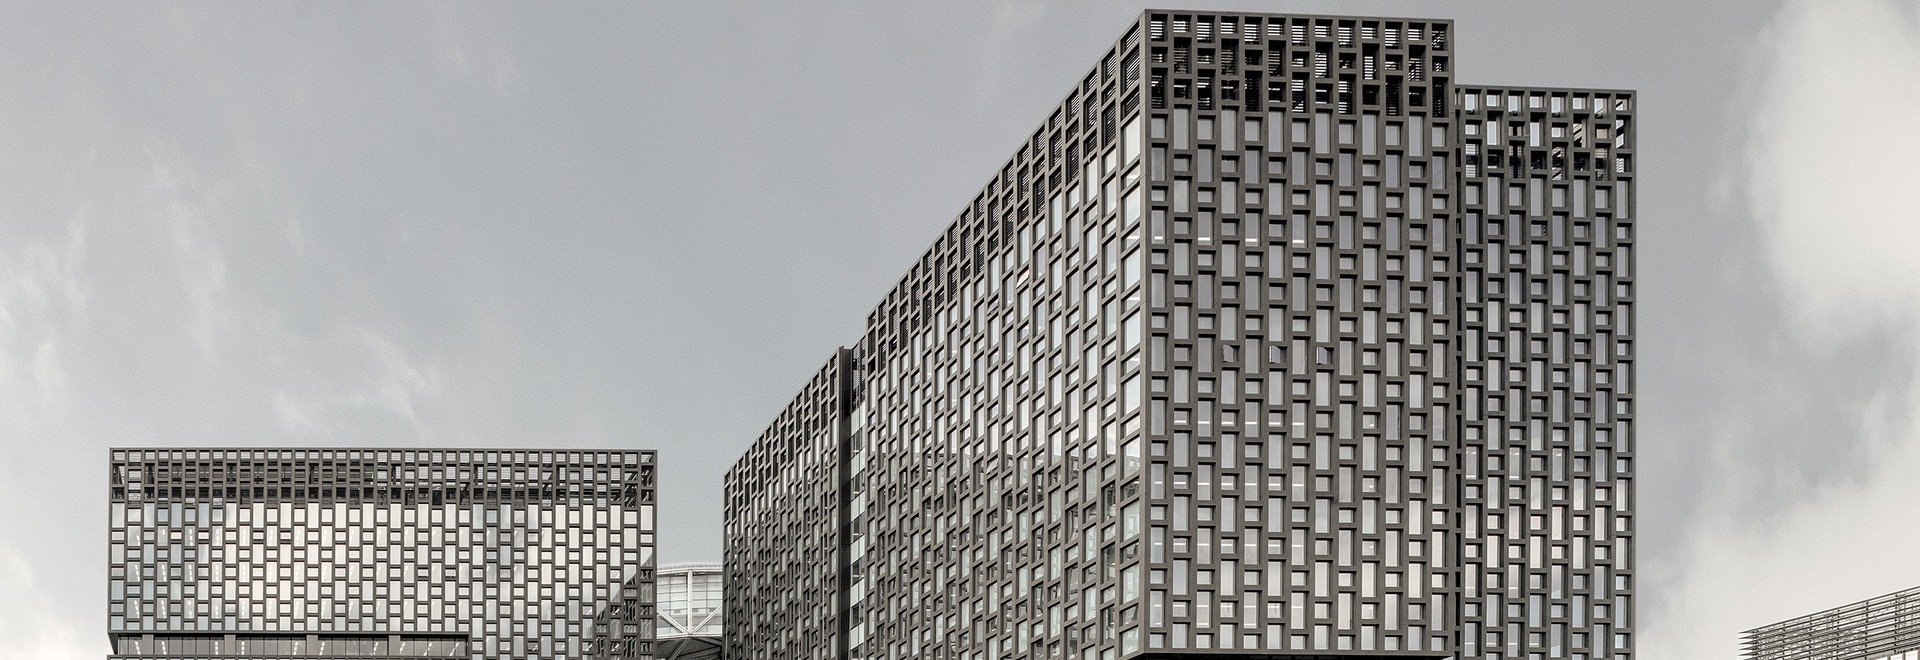 THE REVOLUTIONARY CERAMIC SLAB FOR PUBLIC BUILDINGS